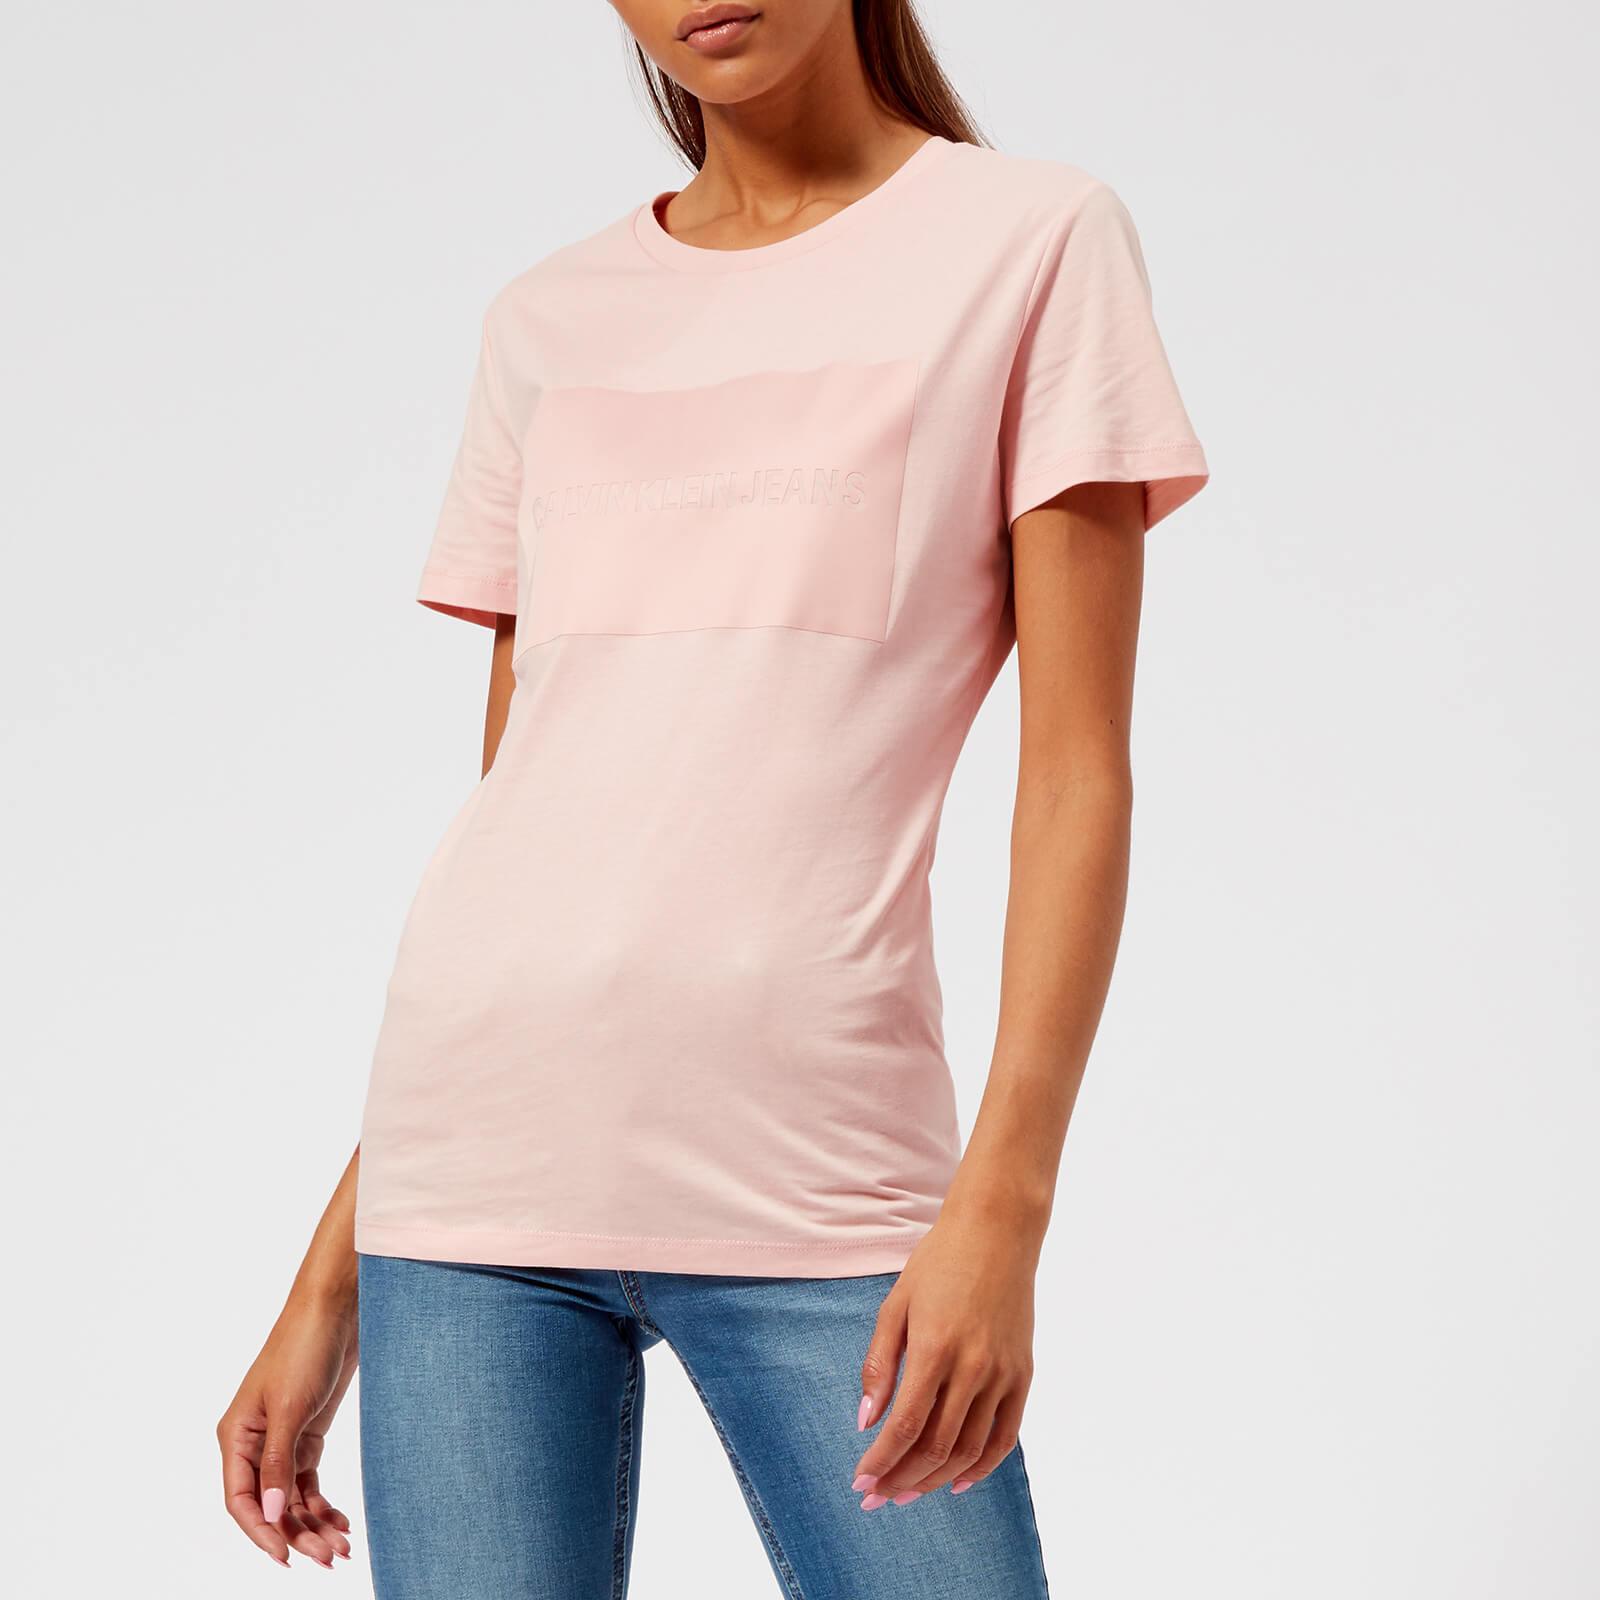 d395b1bd8 Calvin Klein Institutional Satin Box Logo T-shirt in Pink - Lyst